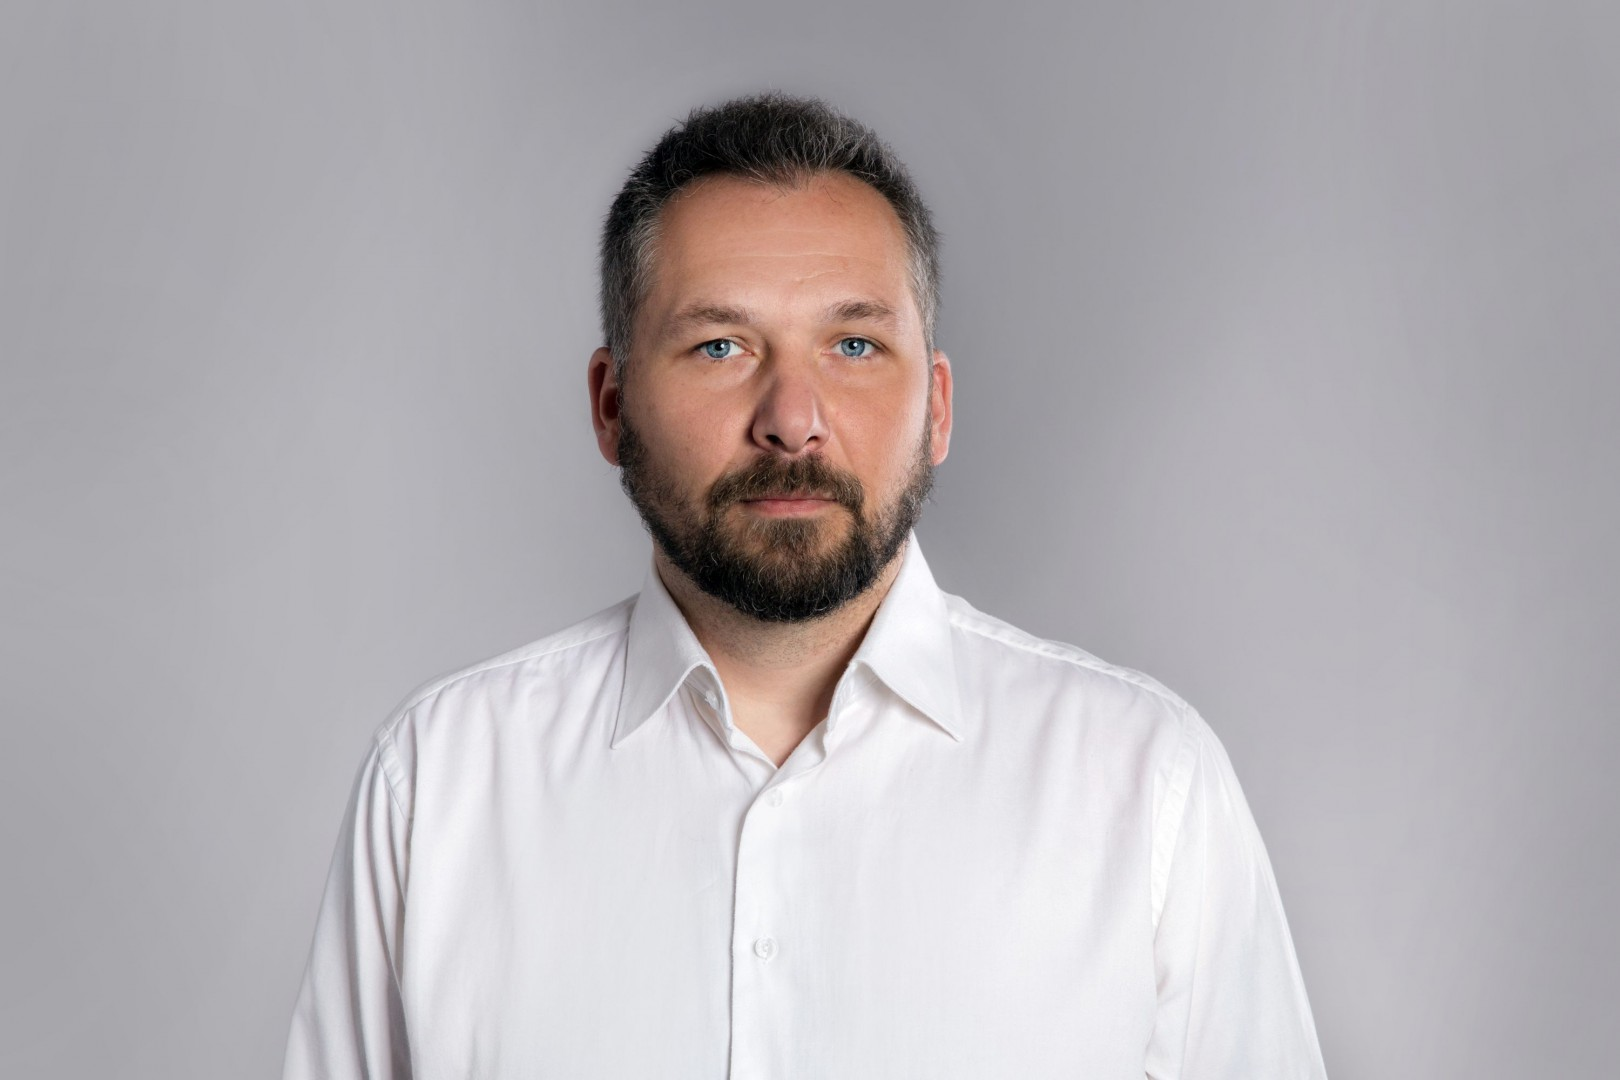 Gabriel Gdula, ekspert ds. materacy salonów Agata